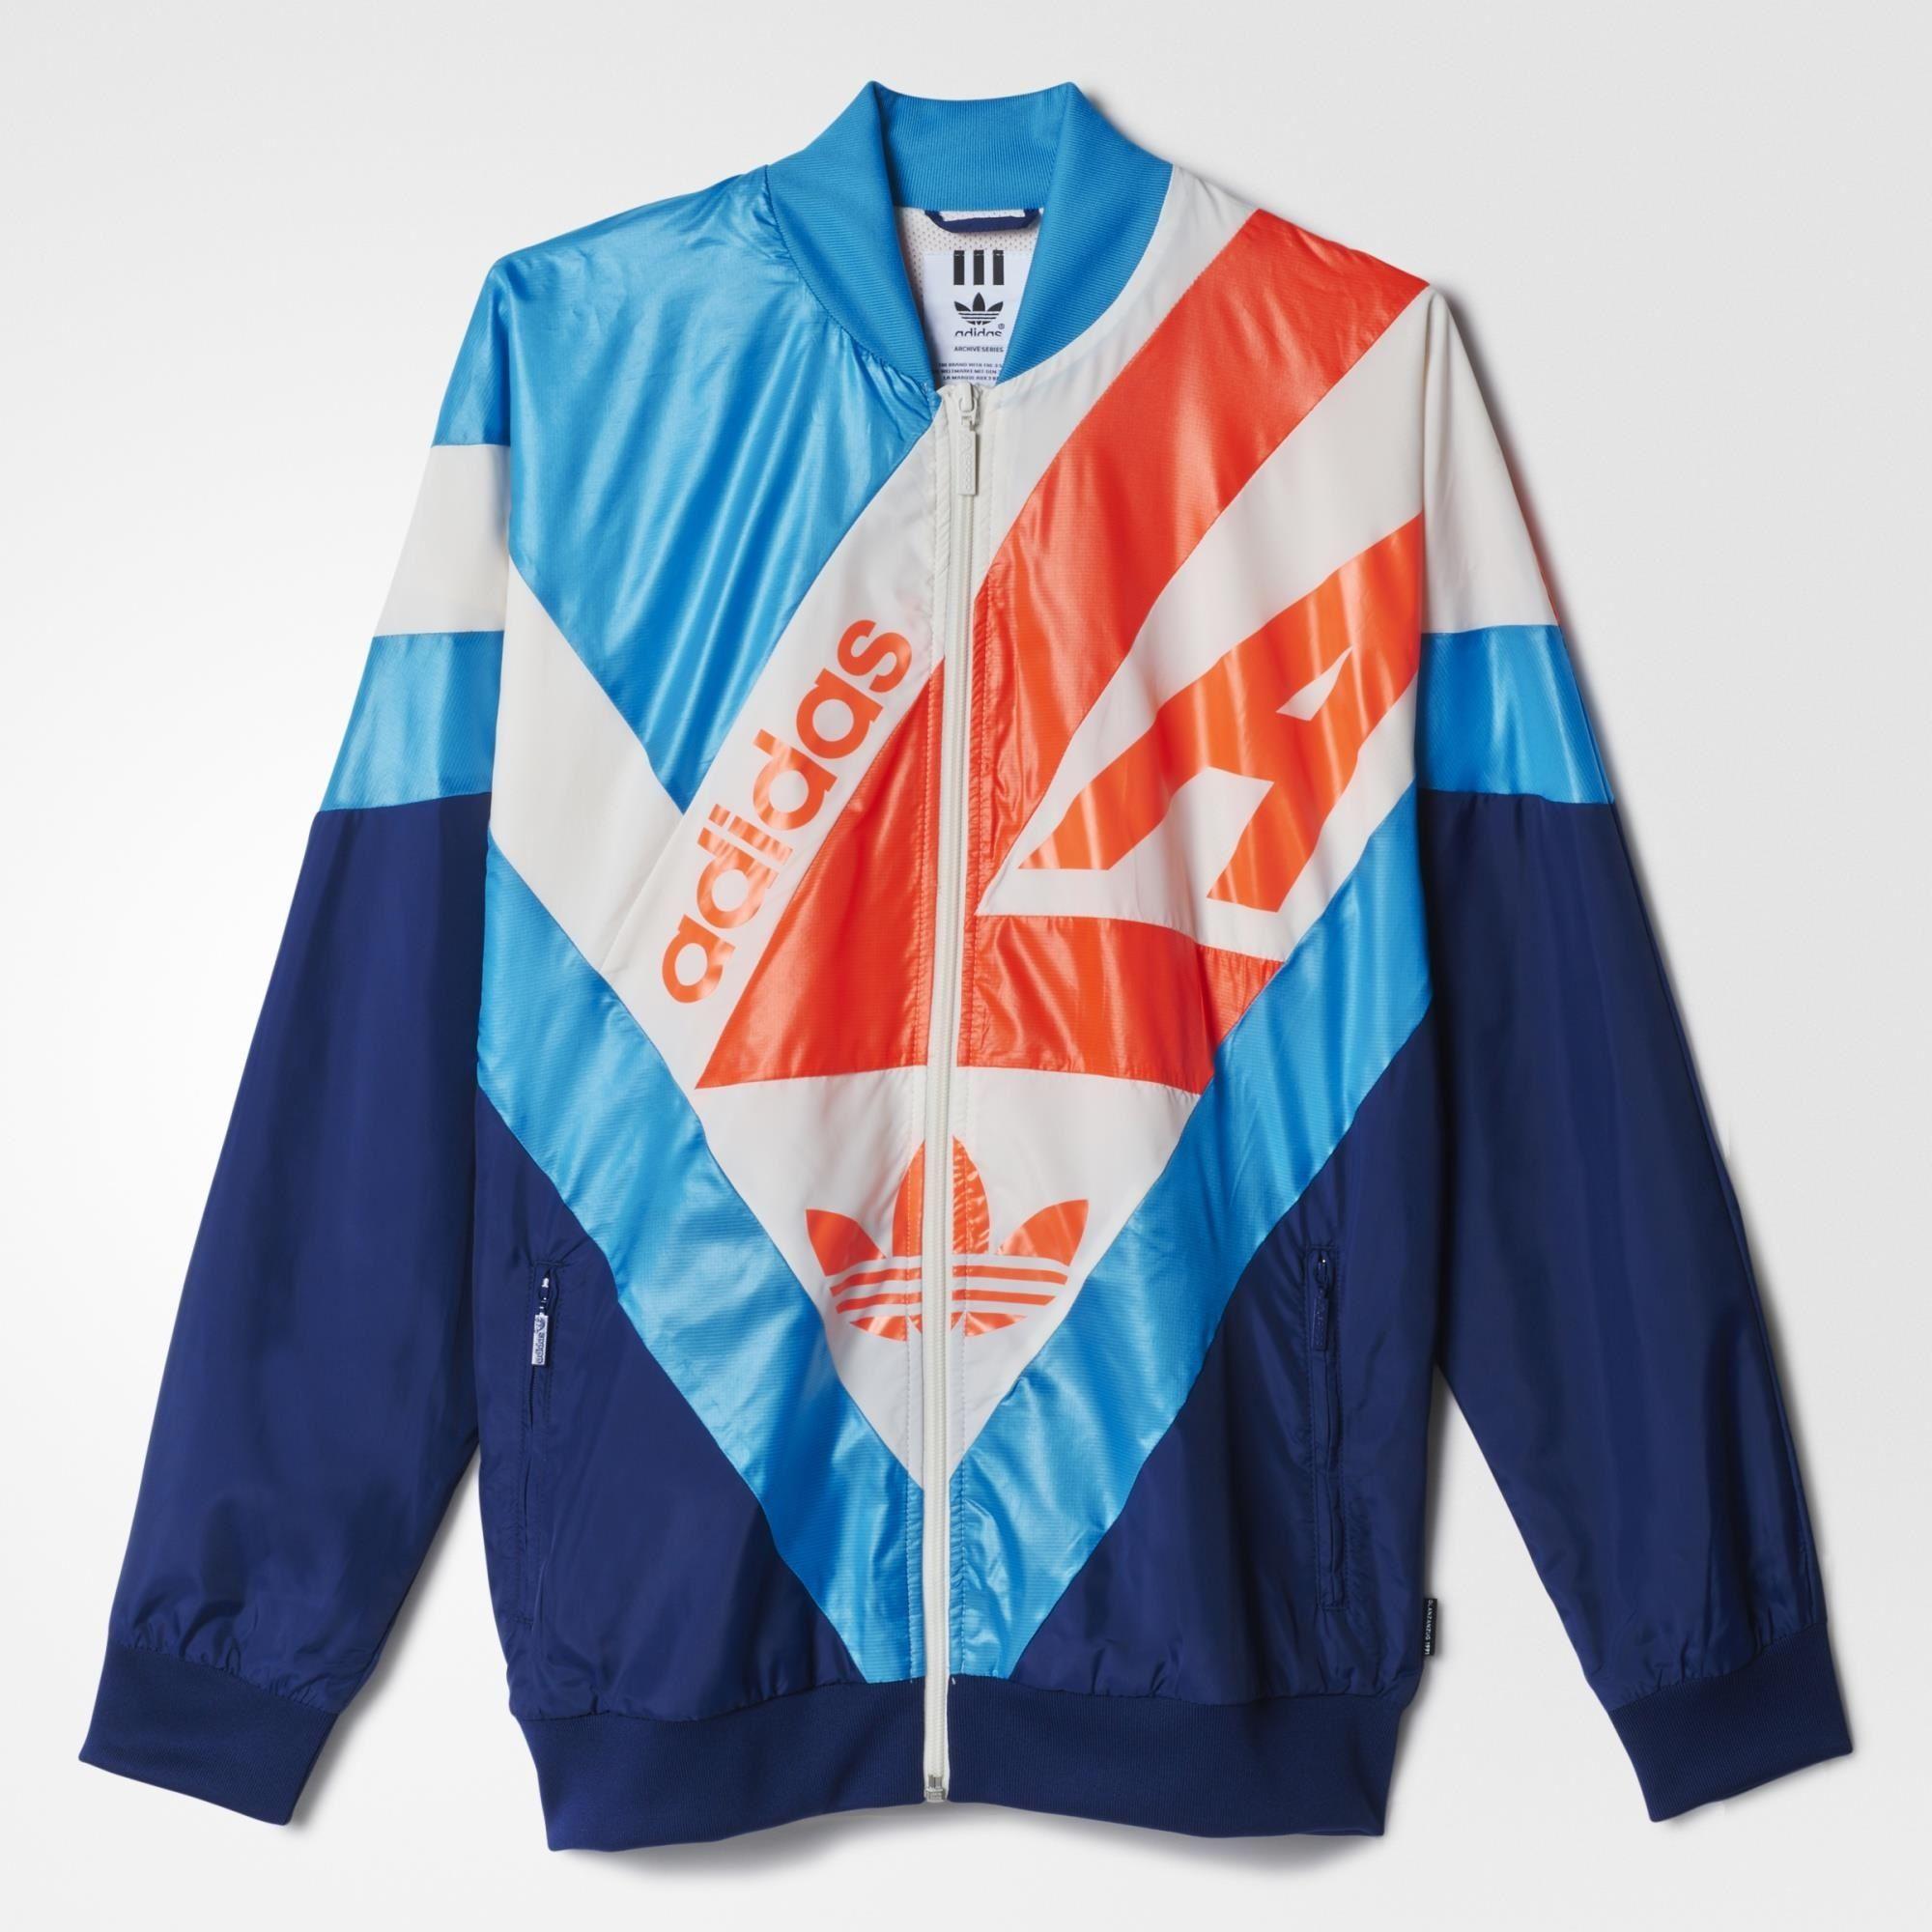 Adidas Archive Supergirl Windbreaker Blue Adidas Us Adidas Jacket Adidas Retro Jackets [ 2000 x 2000 Pixel ]